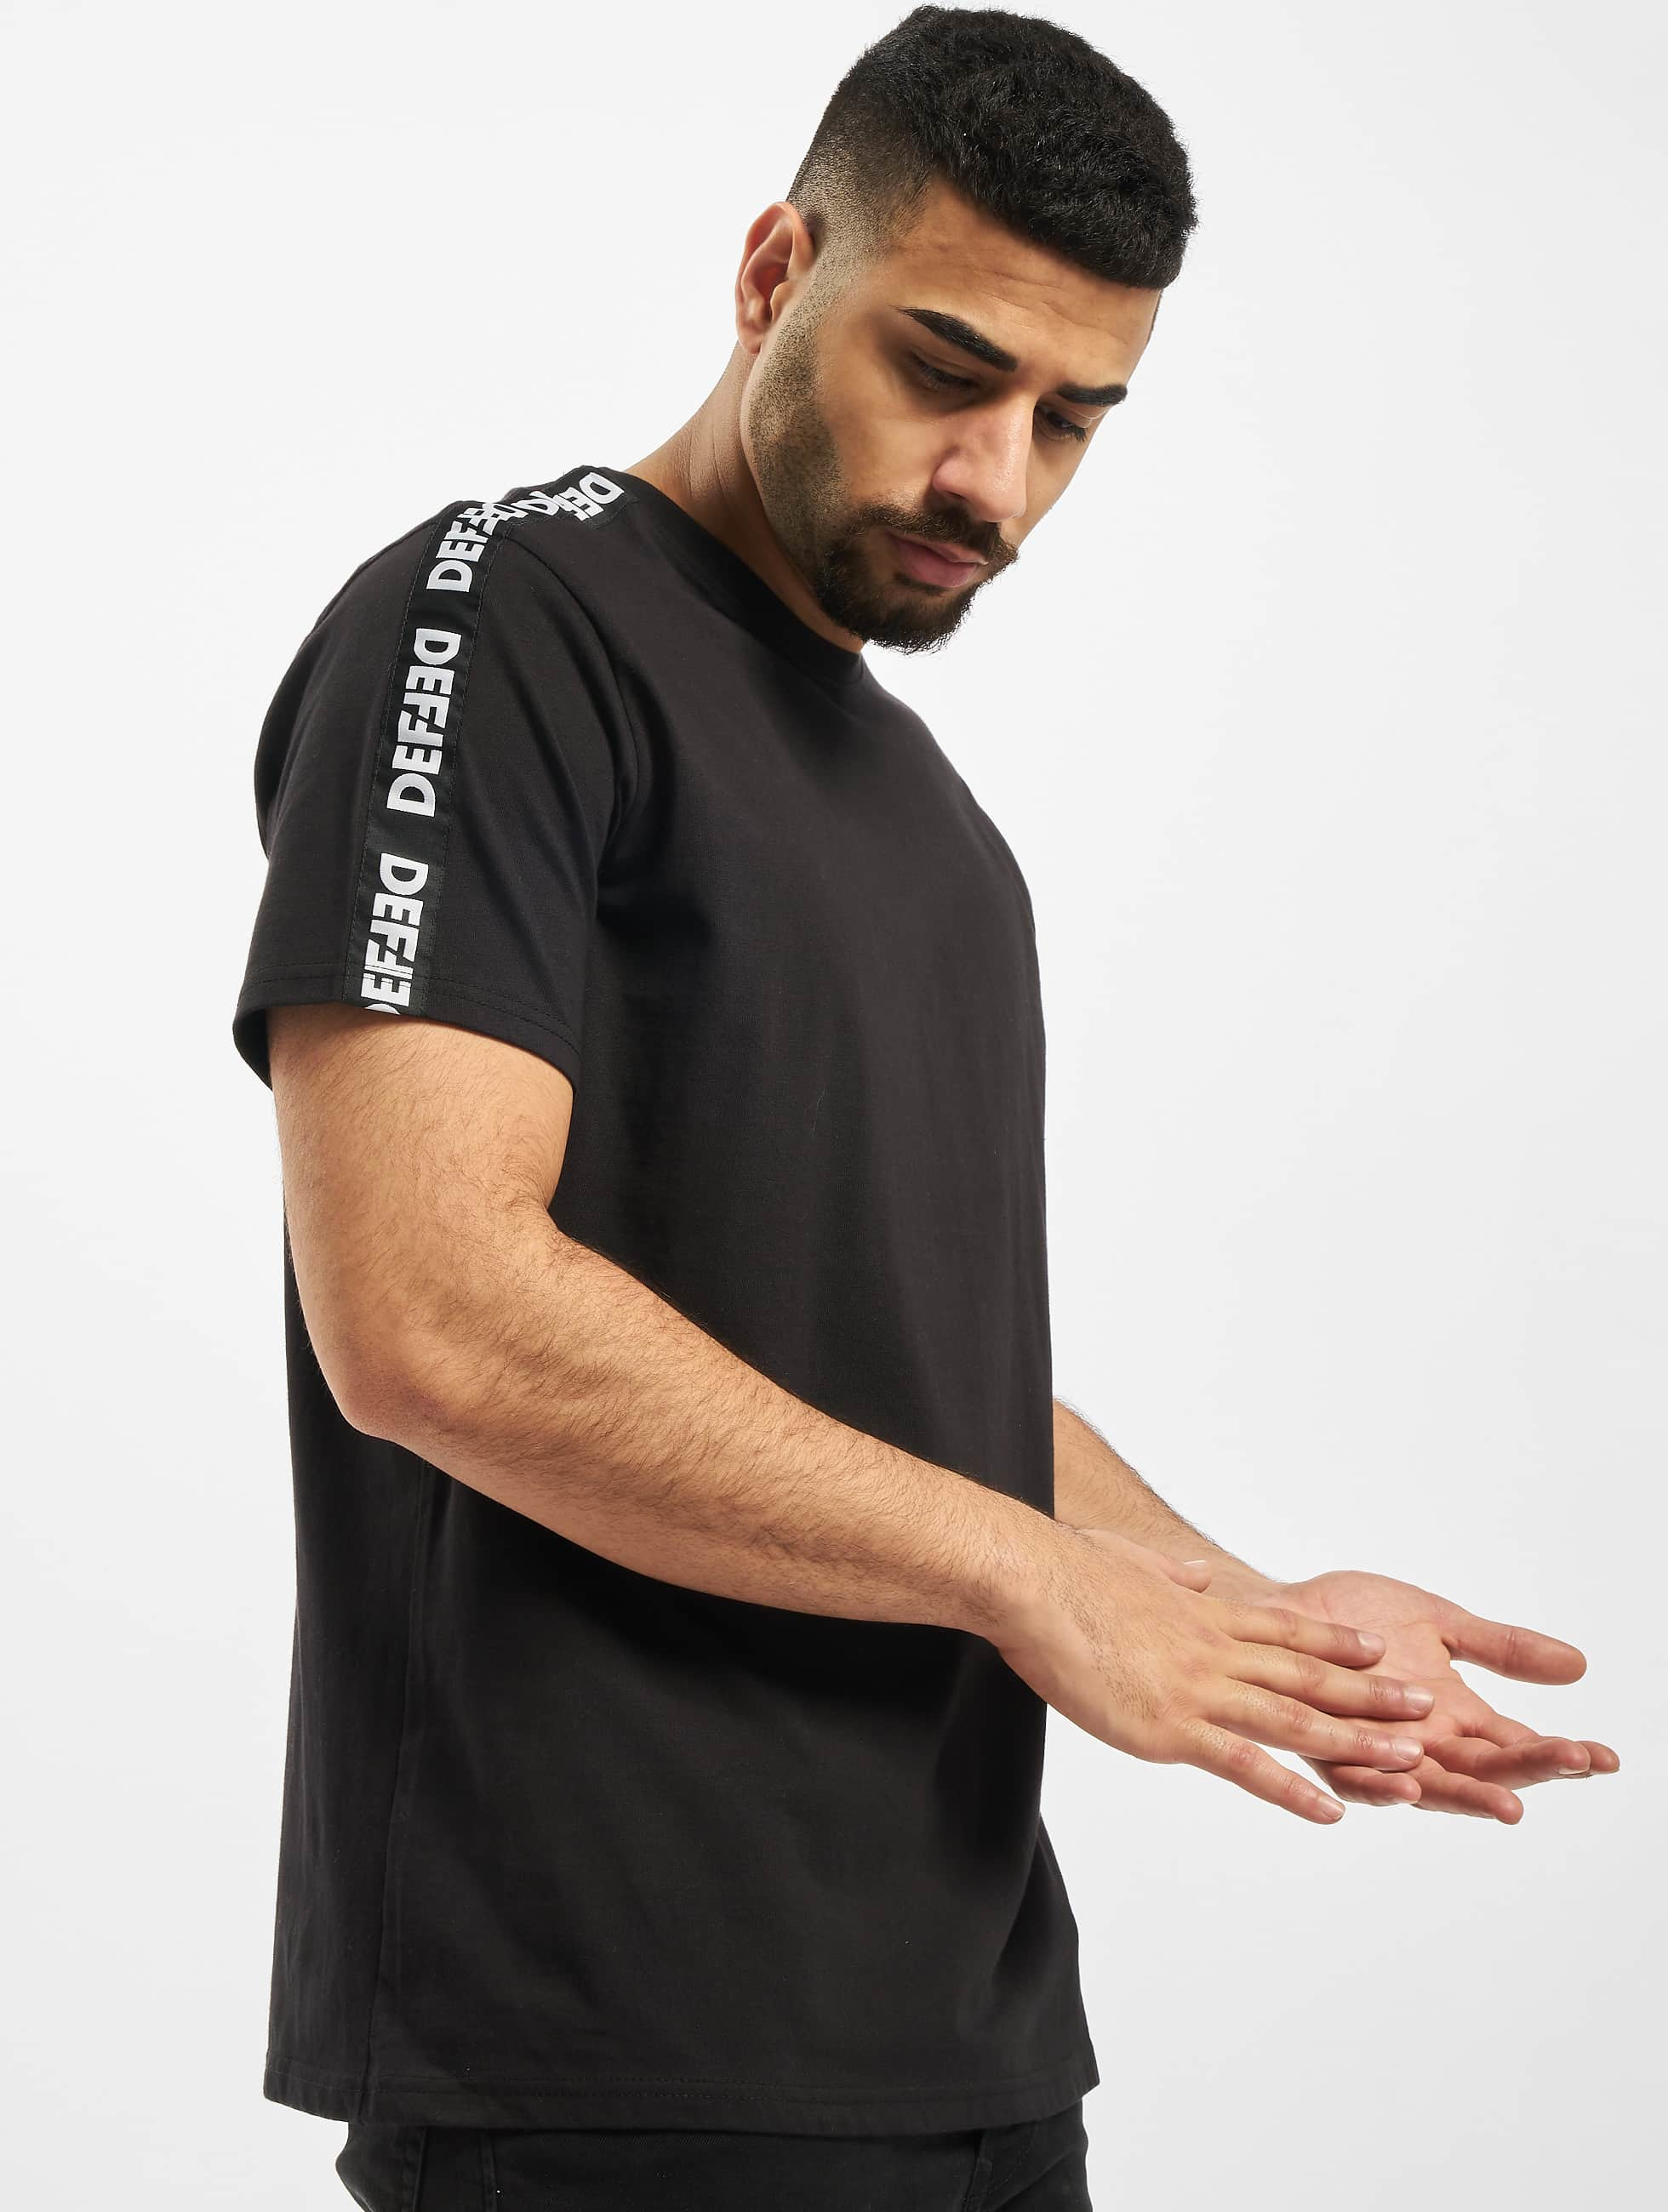 DEF / T-Shirt Hekla in black 2XL